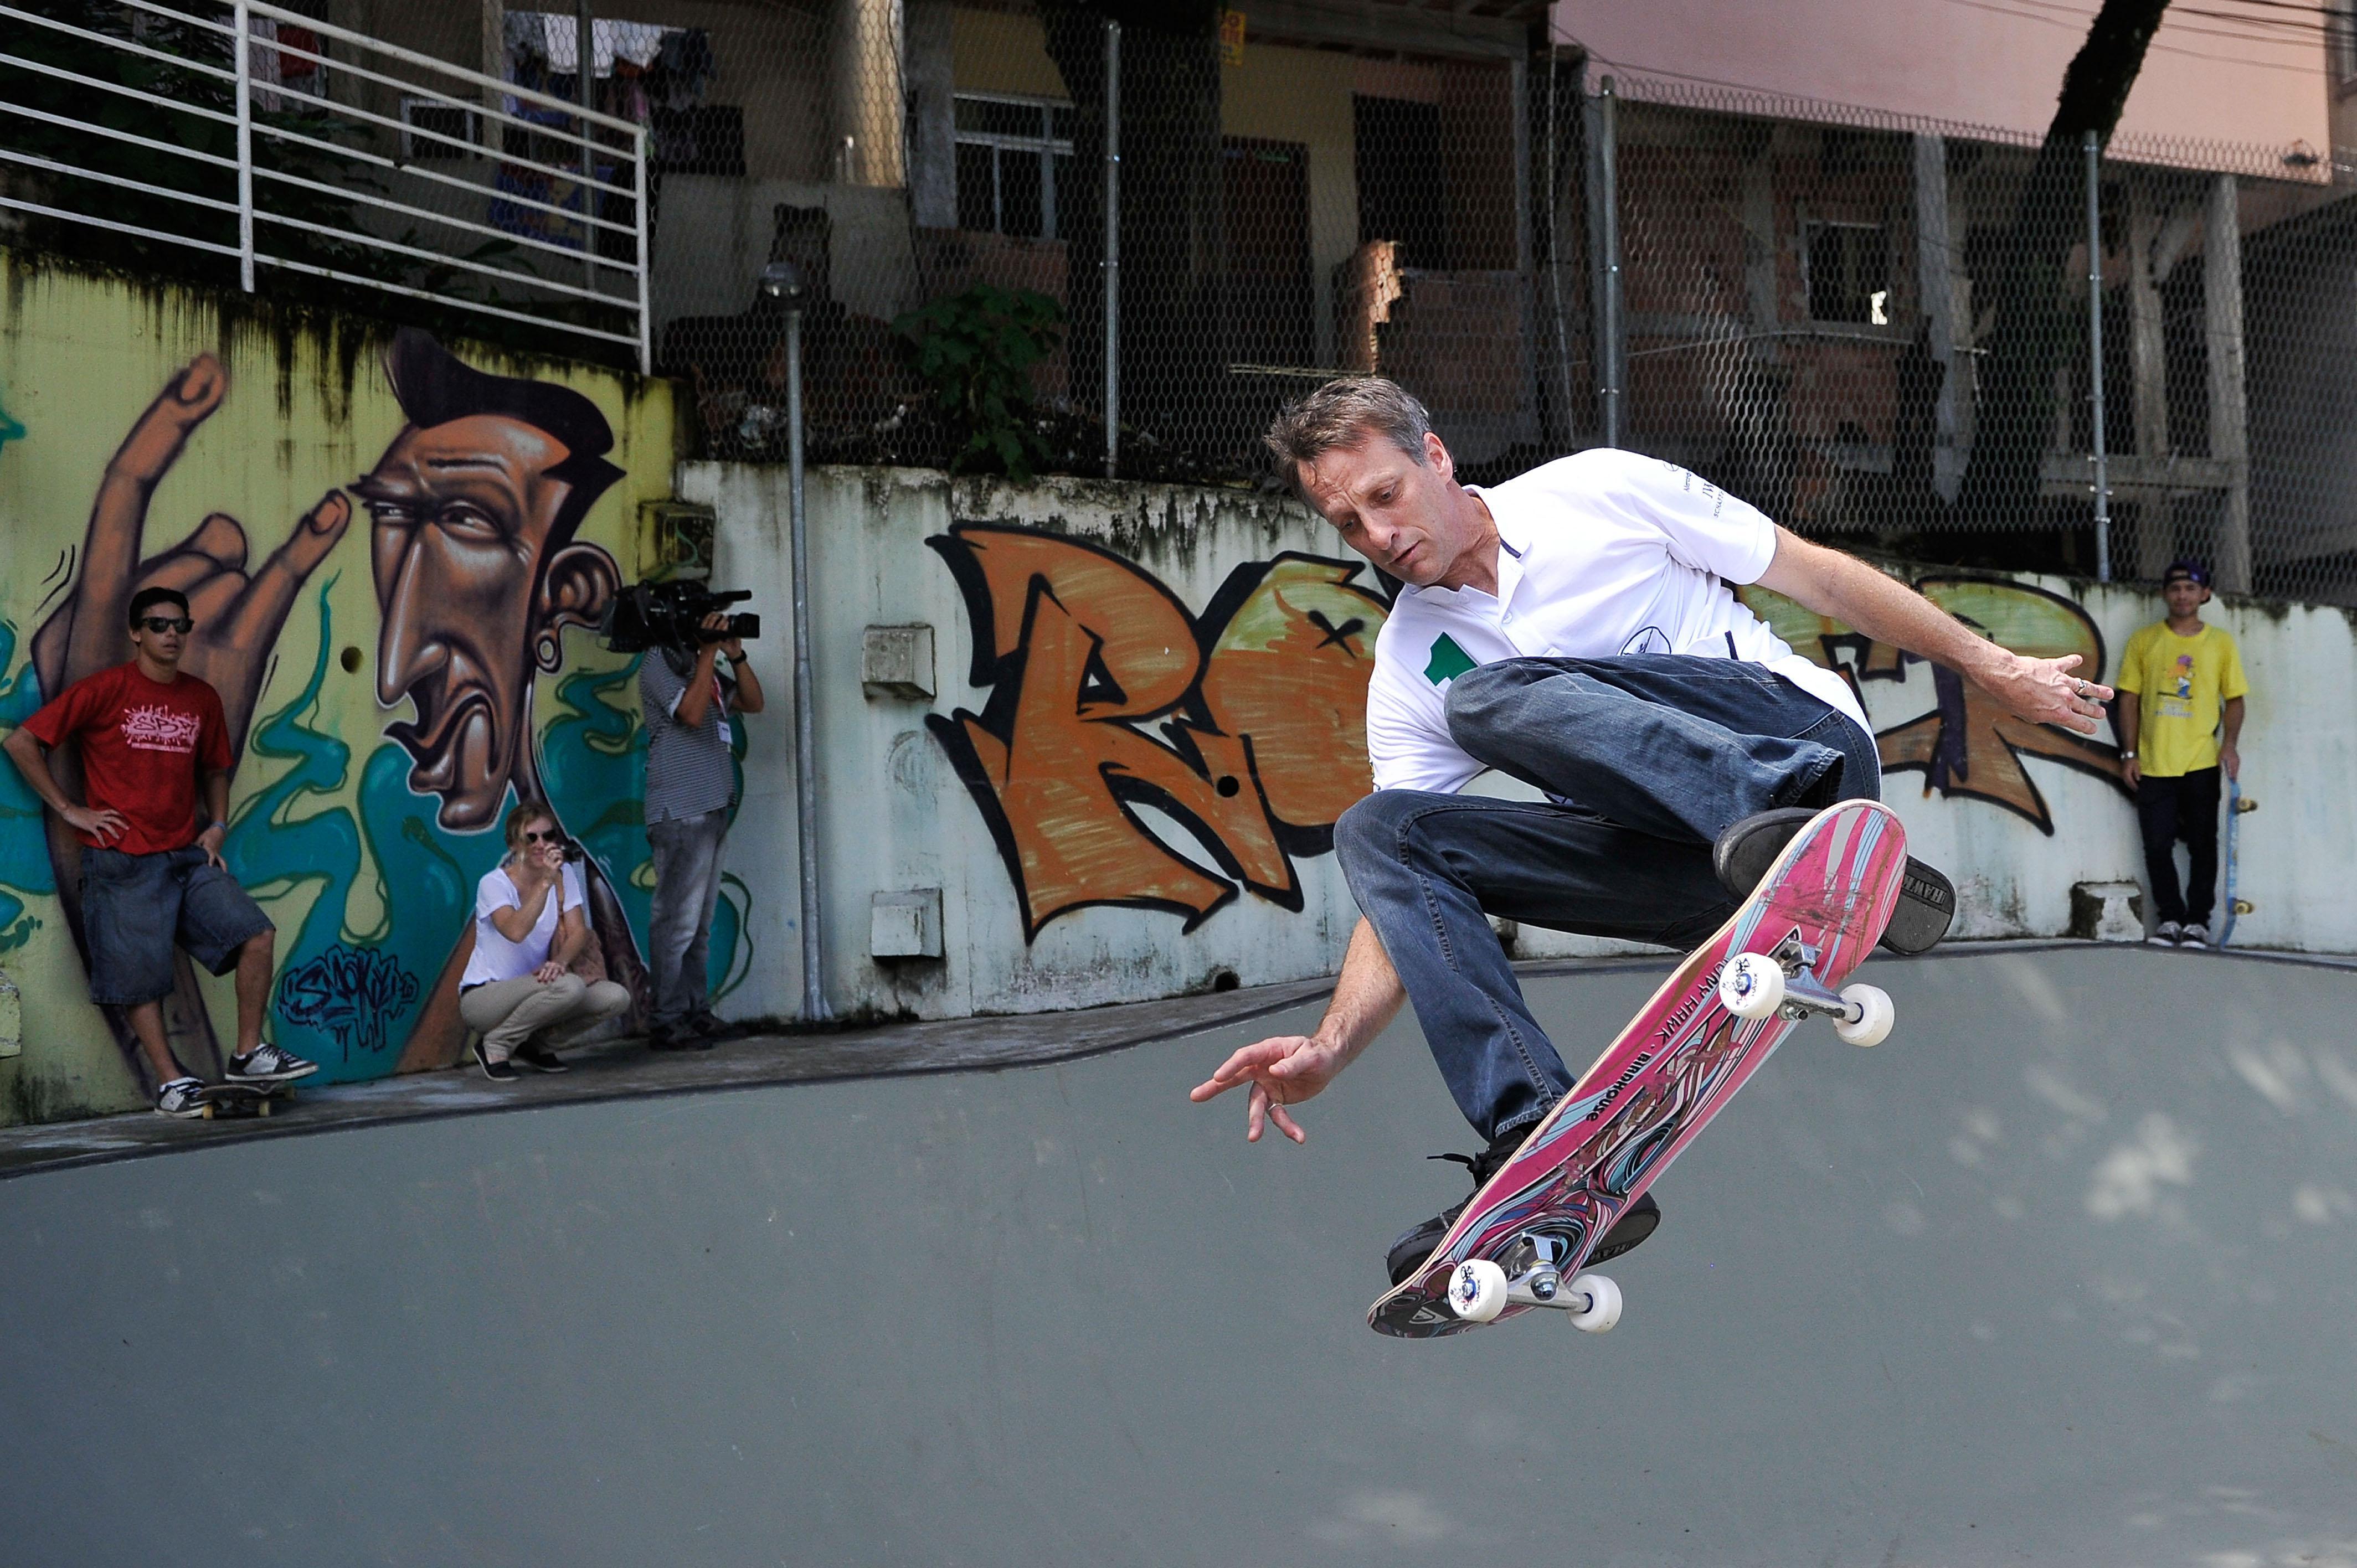 Tony Hawk skateboarding.